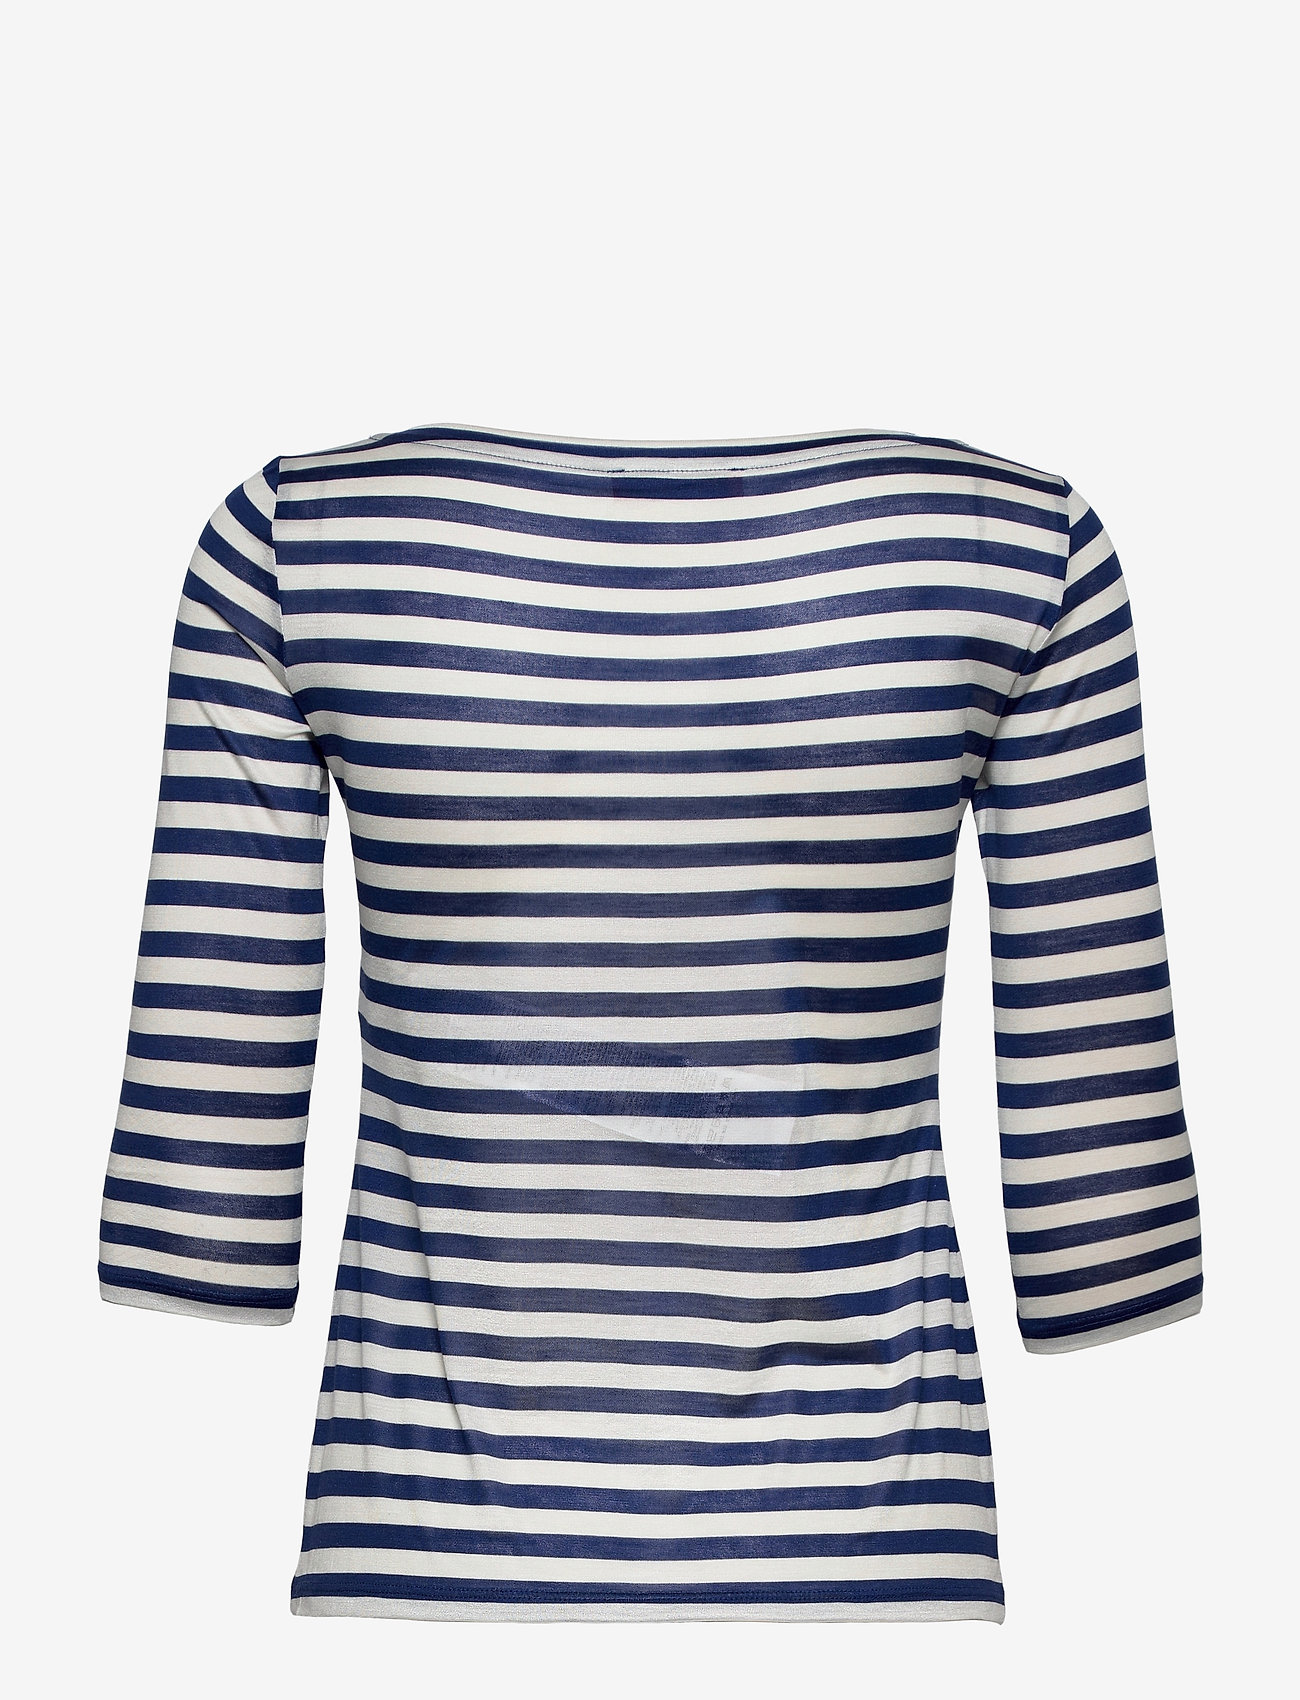 Max&Co. - CULLA - tops met lange mouwen - white pattern - 1